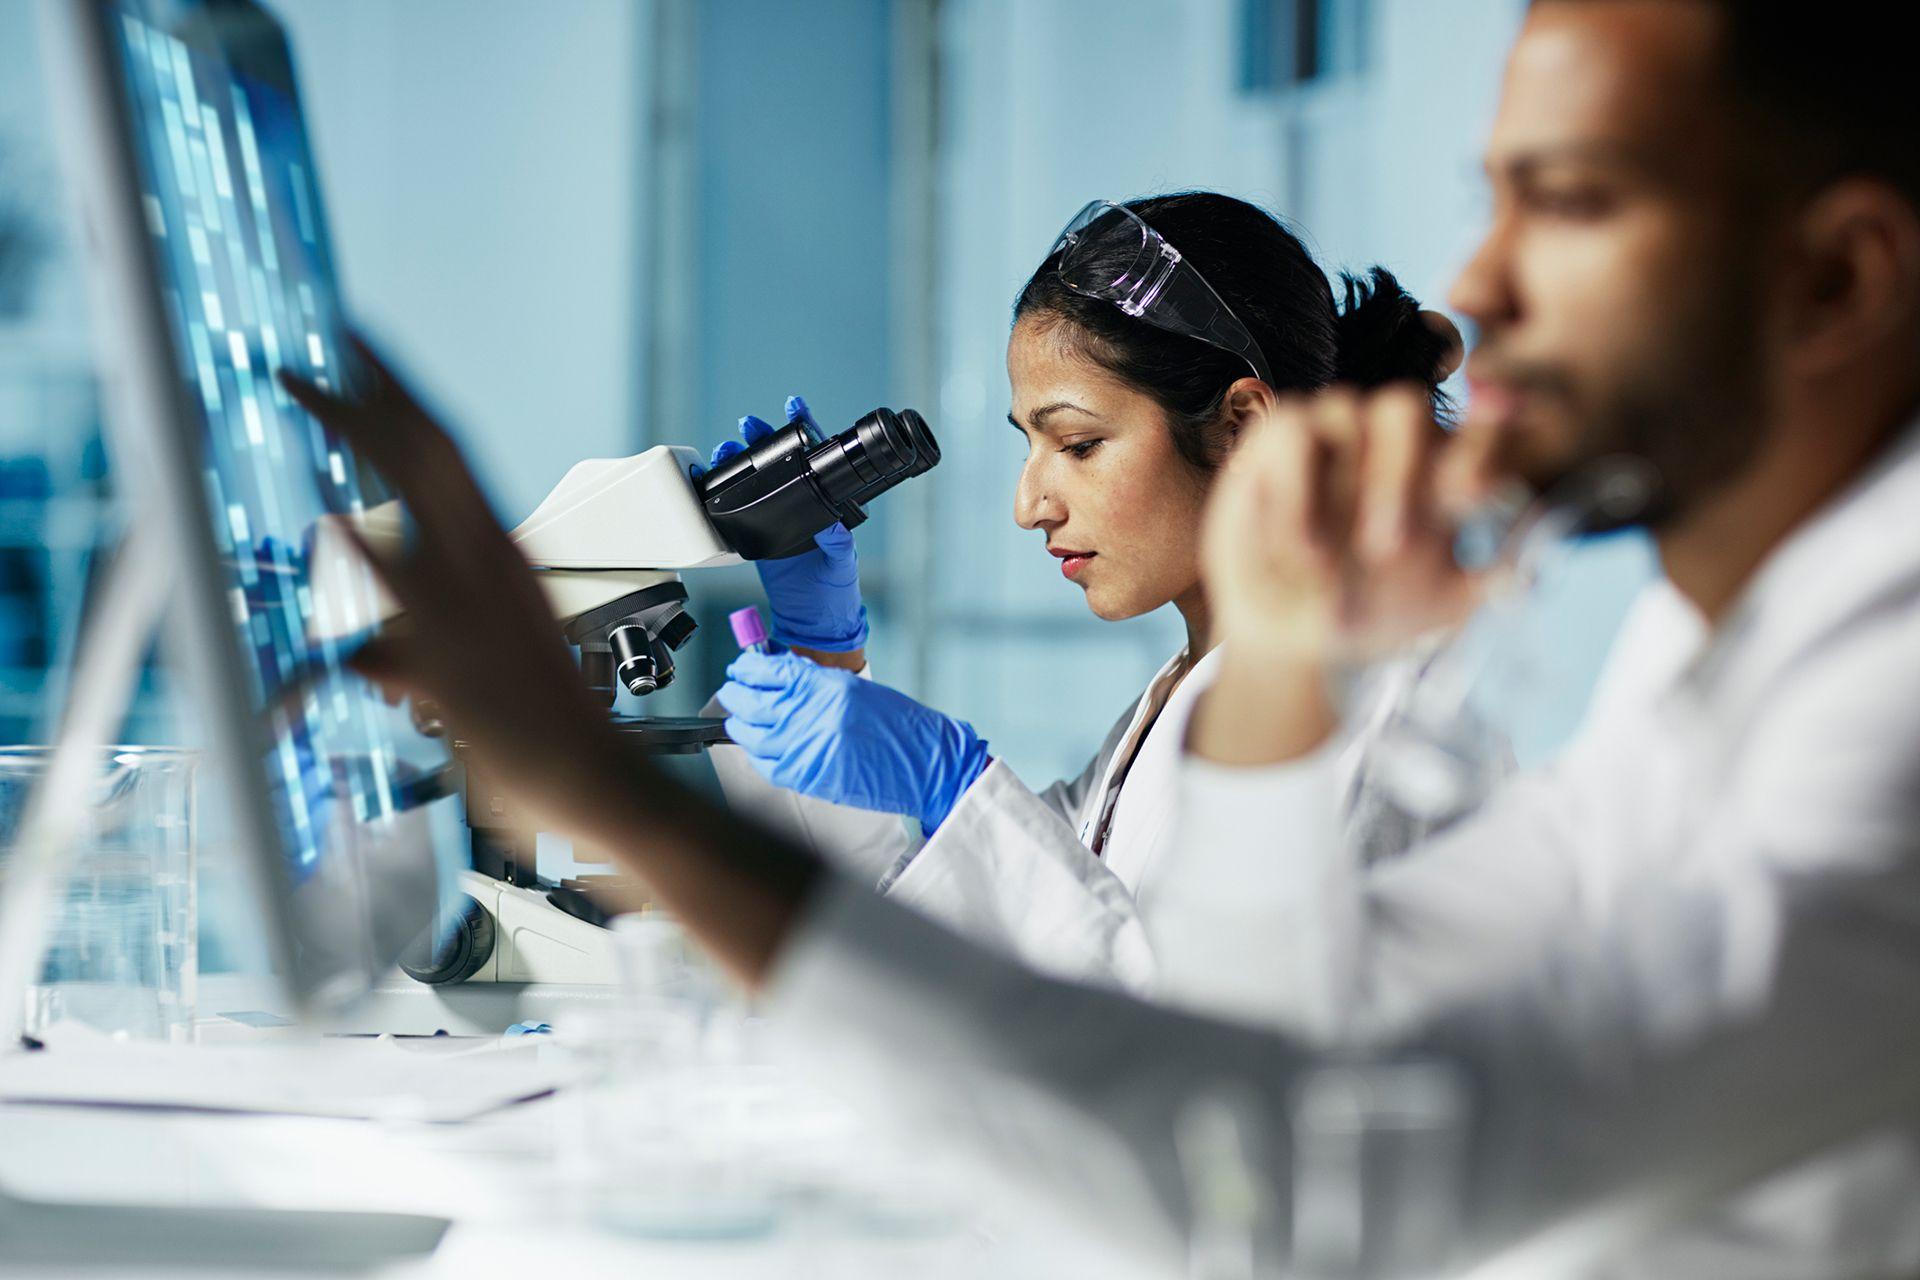 arritmia cardiopatía test genetico